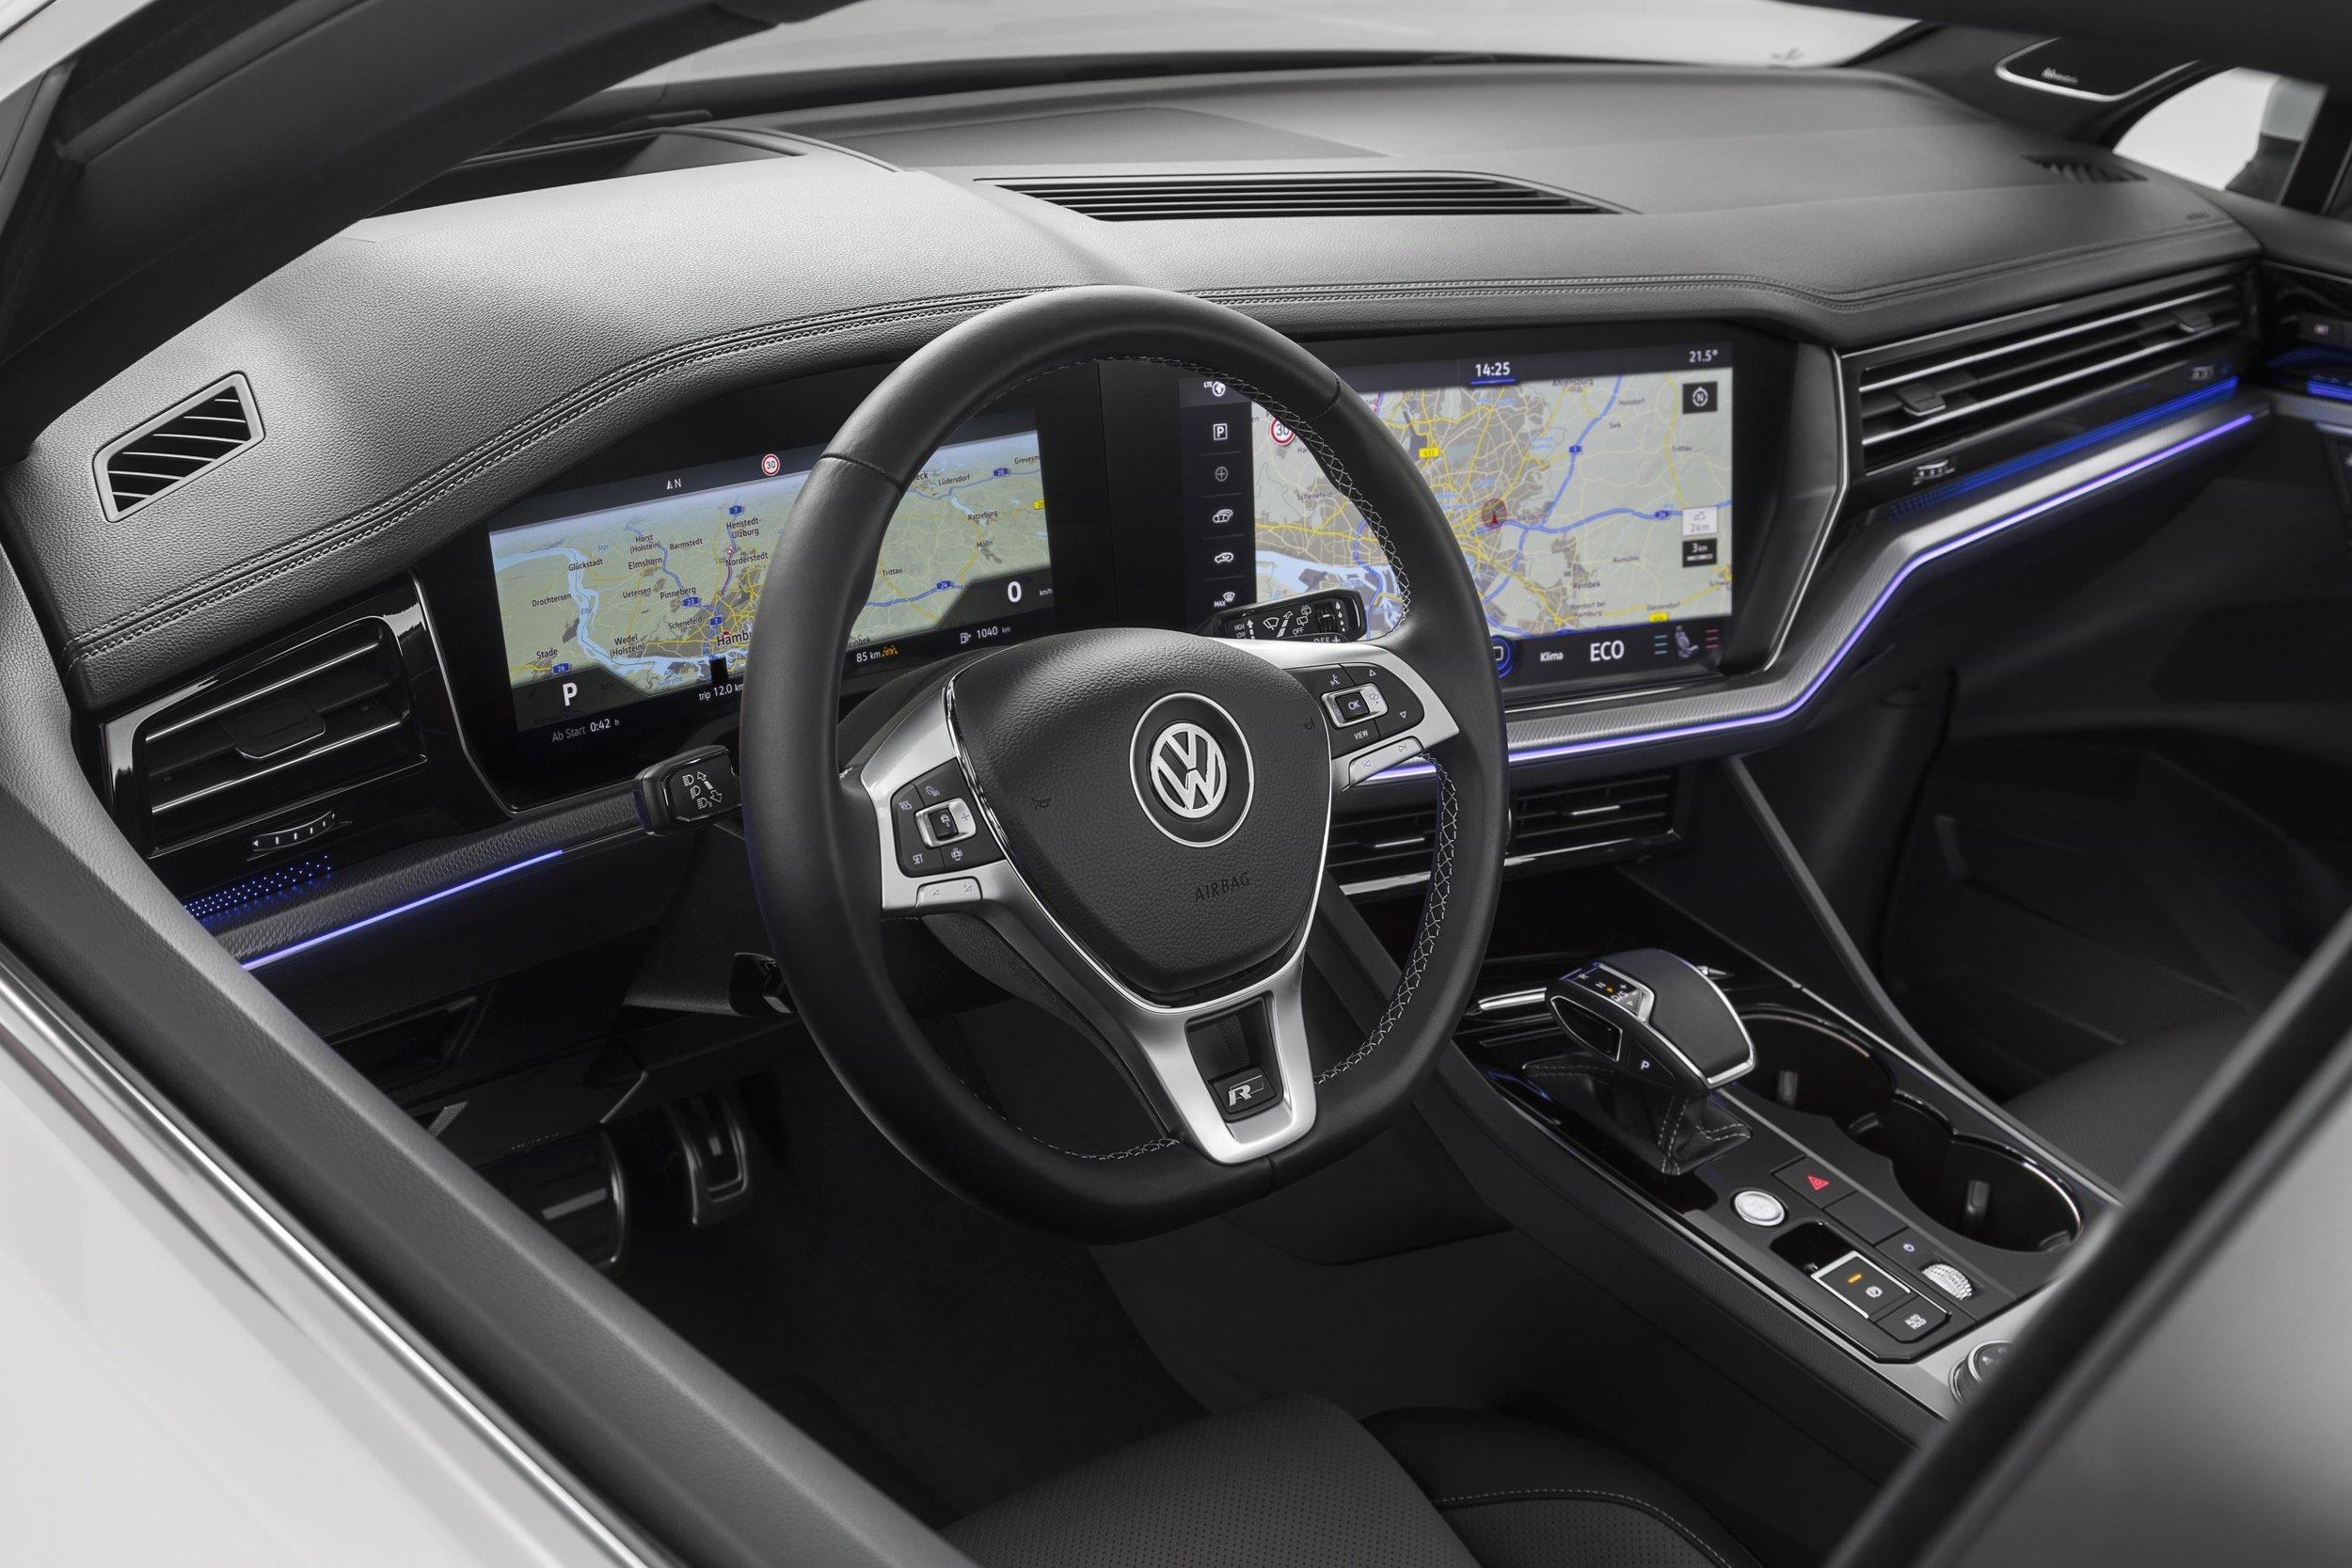 New Touareg - white - interior (18).jpg